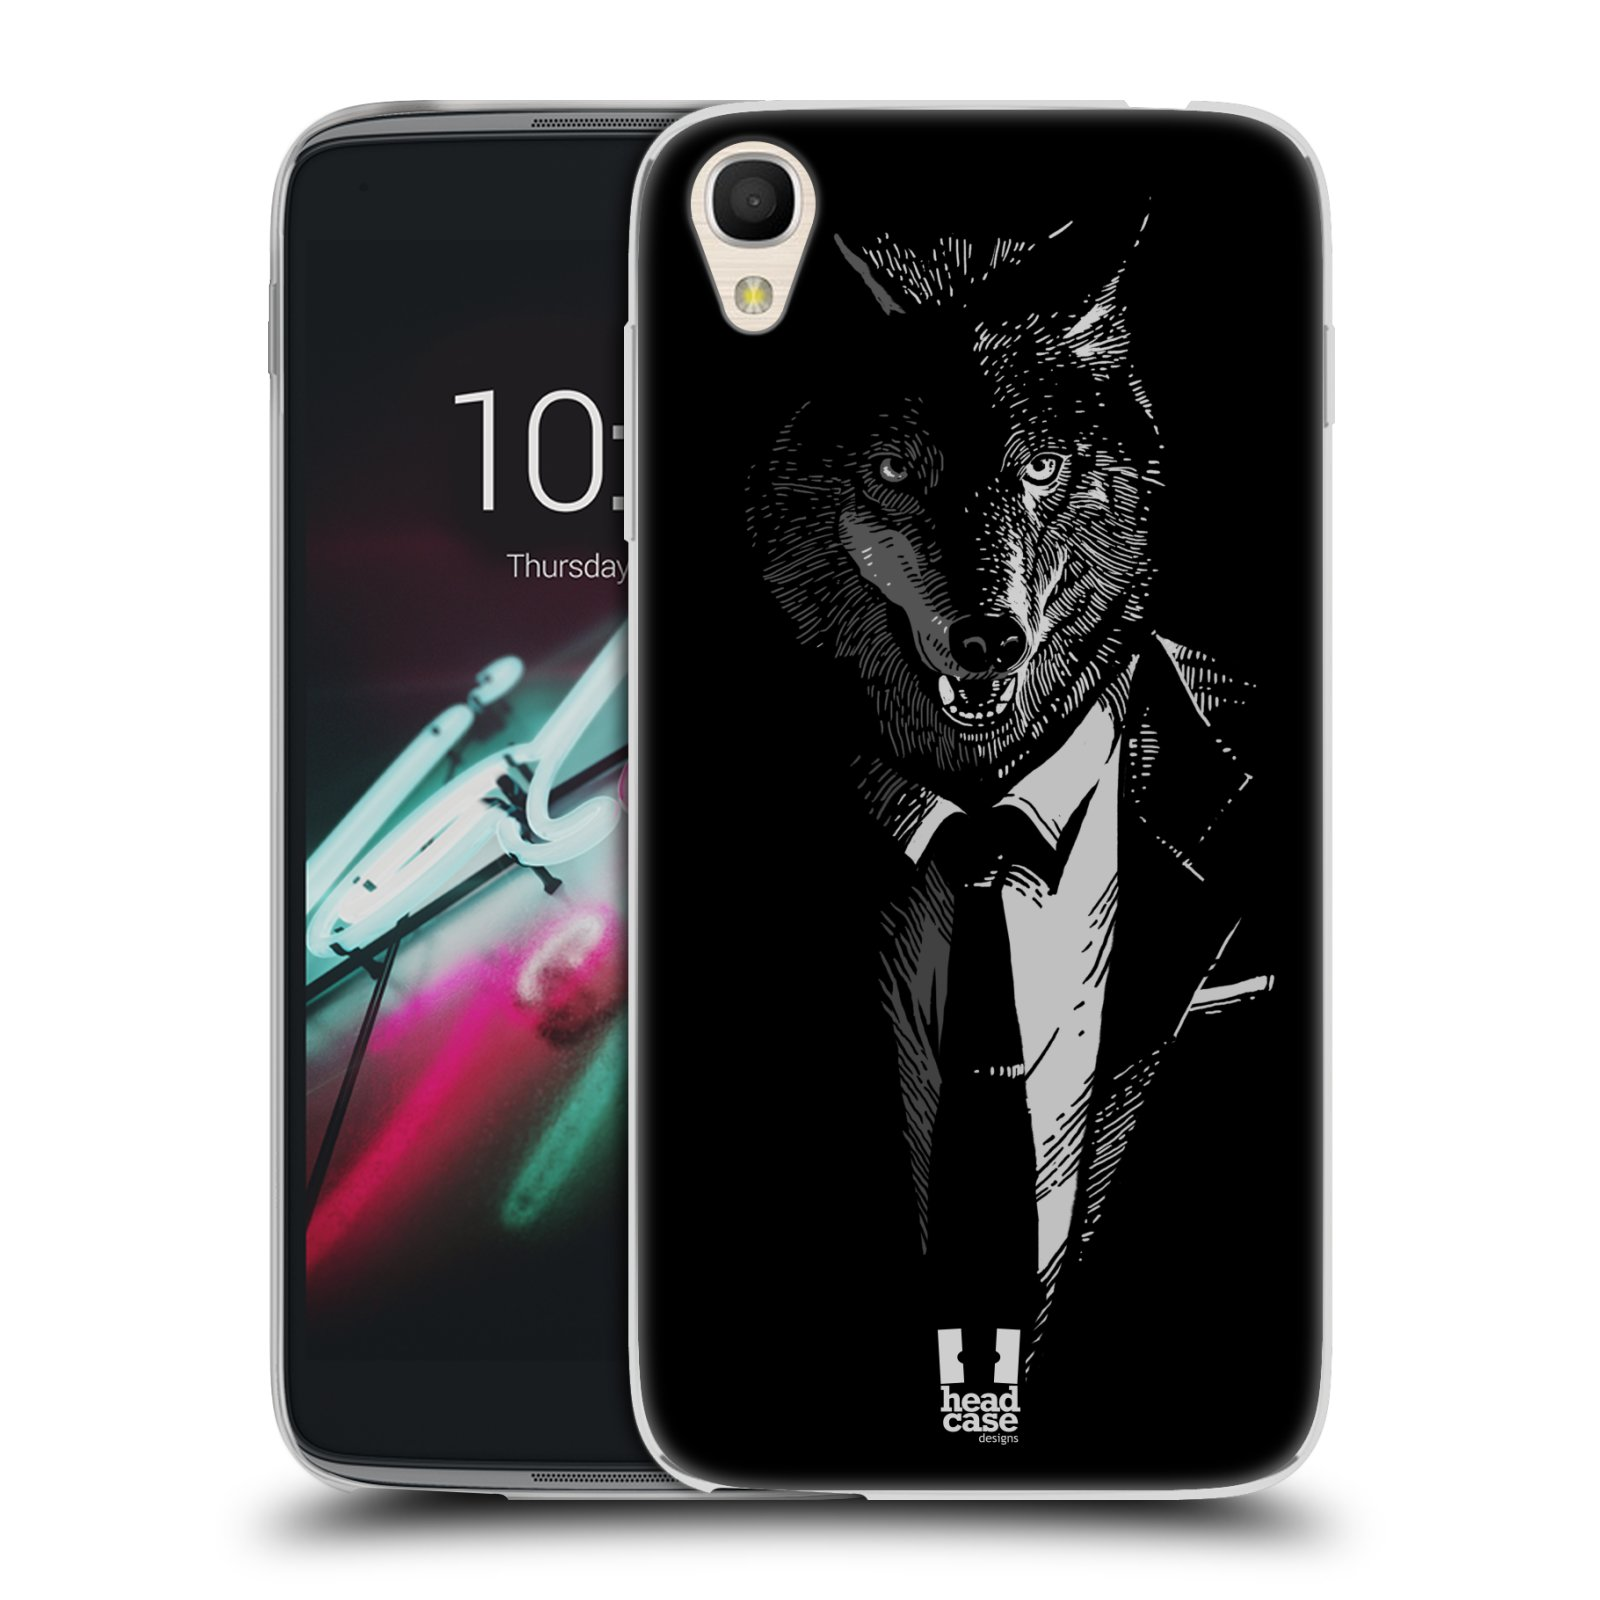 "Silikonové pouzdro na mobil Alcatel One Touch 6039Y Idol 3 HEAD CASE VLK V KVÁDRU (Silikonový kryt či obal na mobilní telefon Alcatel One Touch Idol 3 OT-6039Y s 4,7"" displejem)"